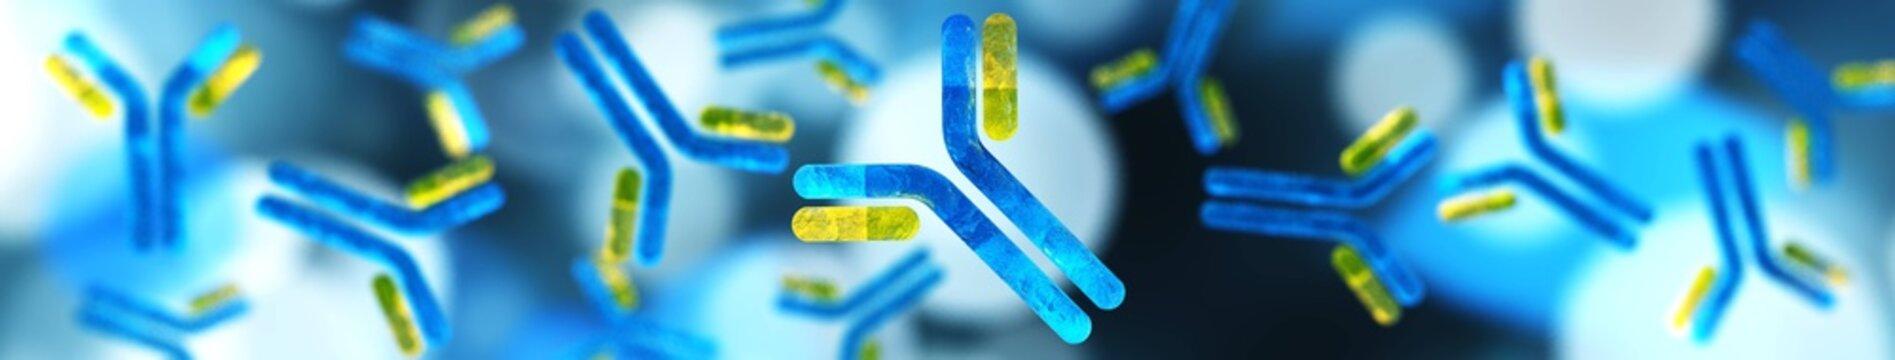 antibodies, immunoglobulins, the immune system,